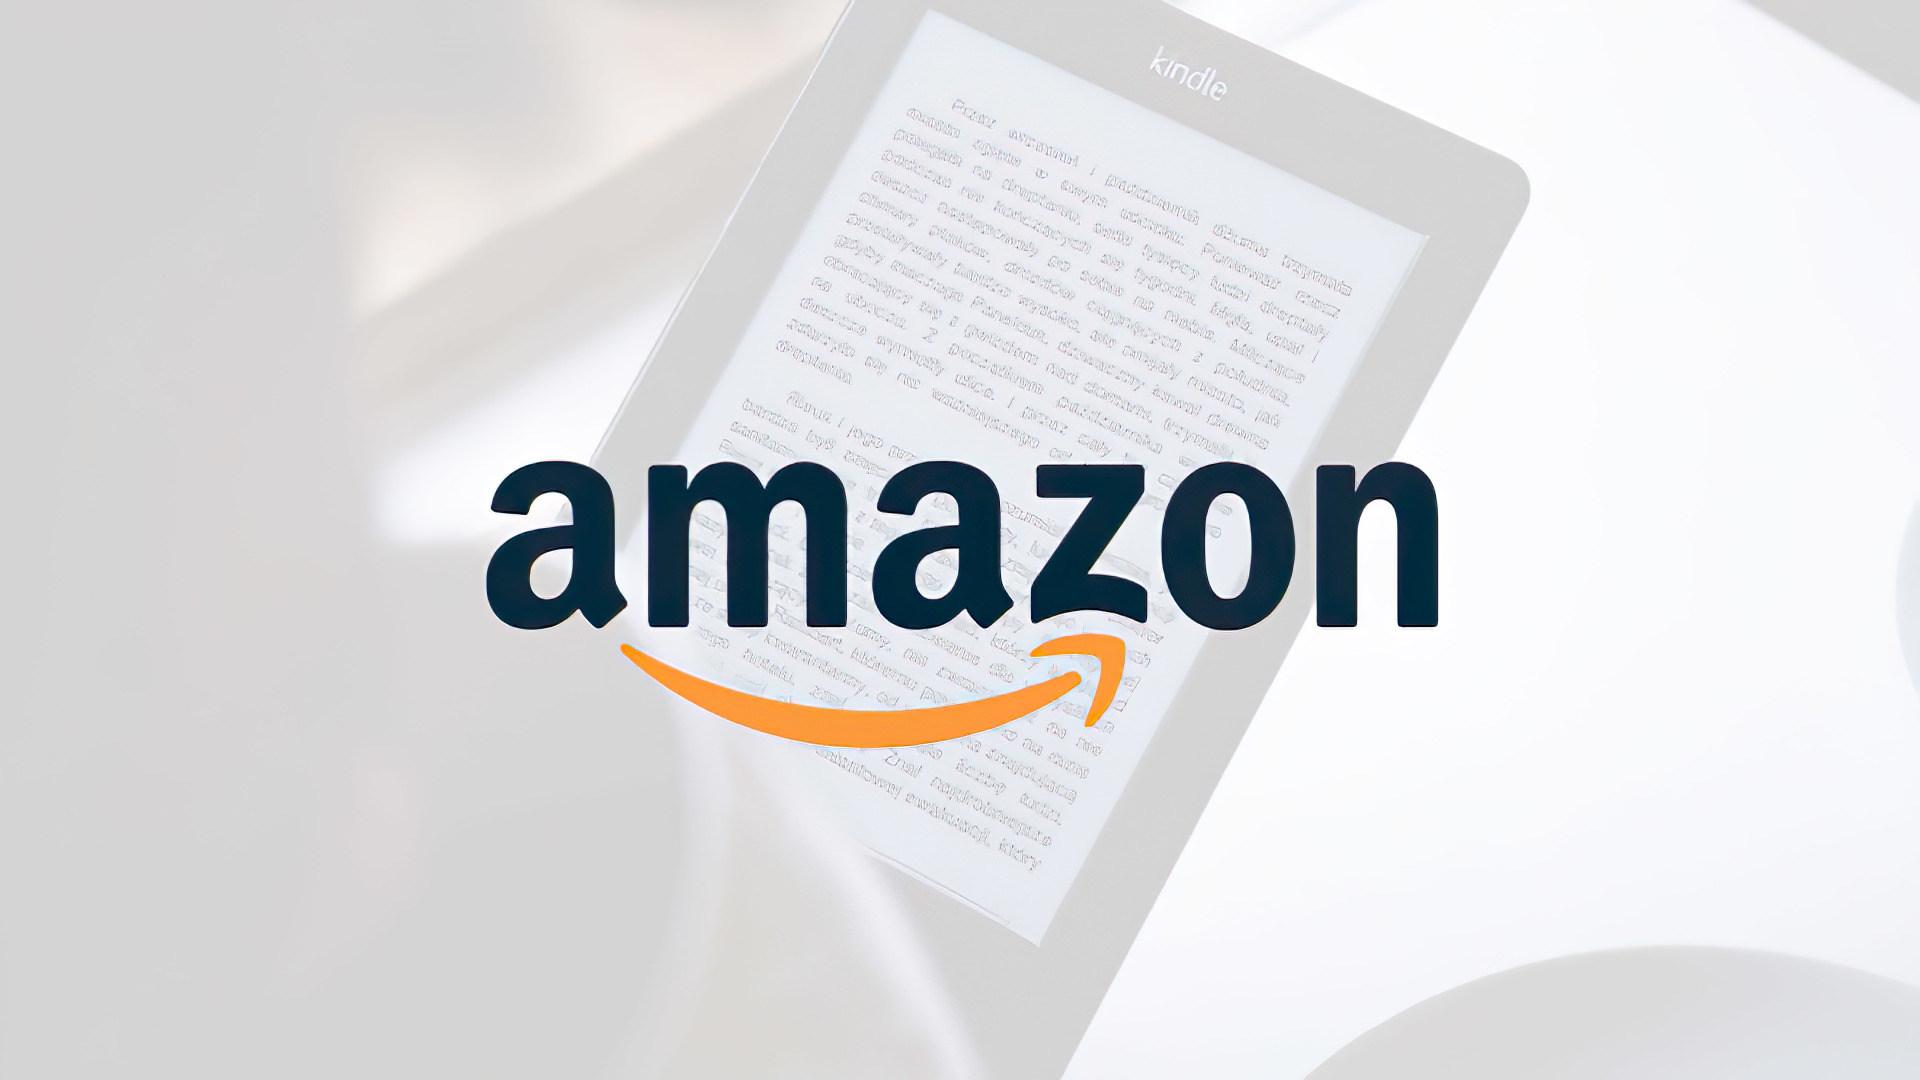 Amazon, Sprachassistent, Kindle, Alexa, E-Book, Amazon Kindle, Reader, Amazon Kindle Fire, Amazon Logo